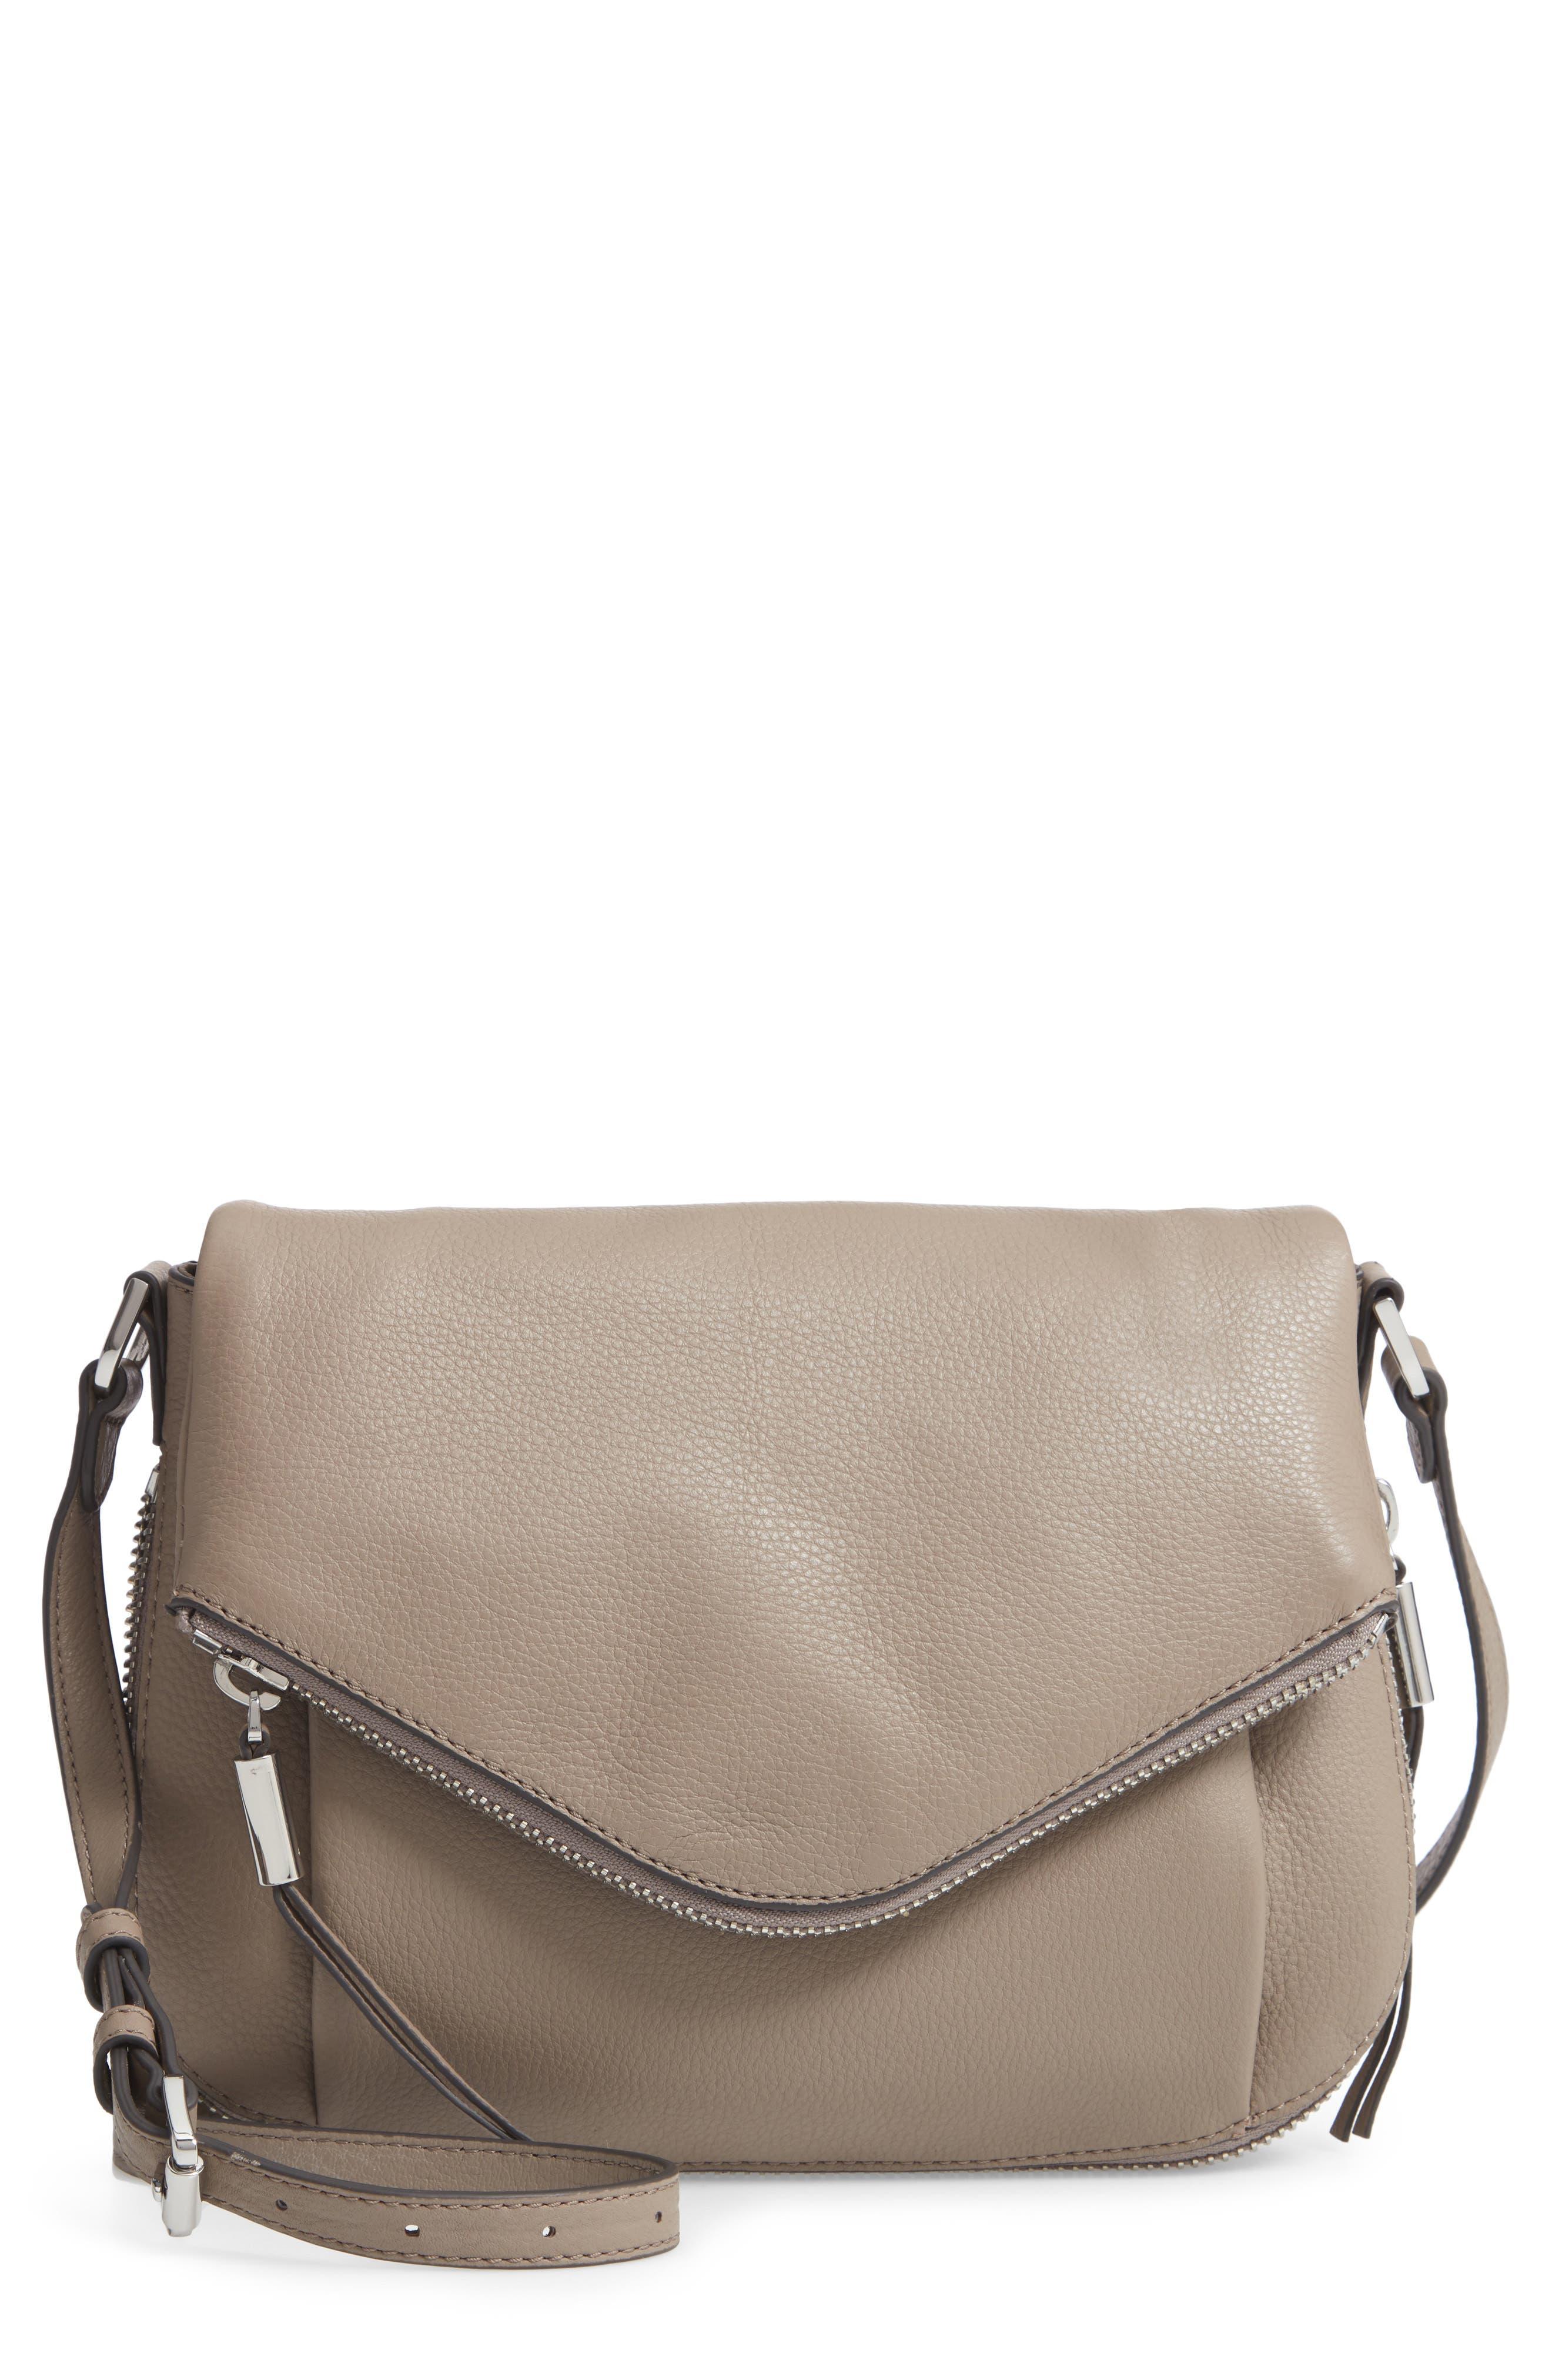 Key Leather Crossbody Bag - Grey in Tranquility